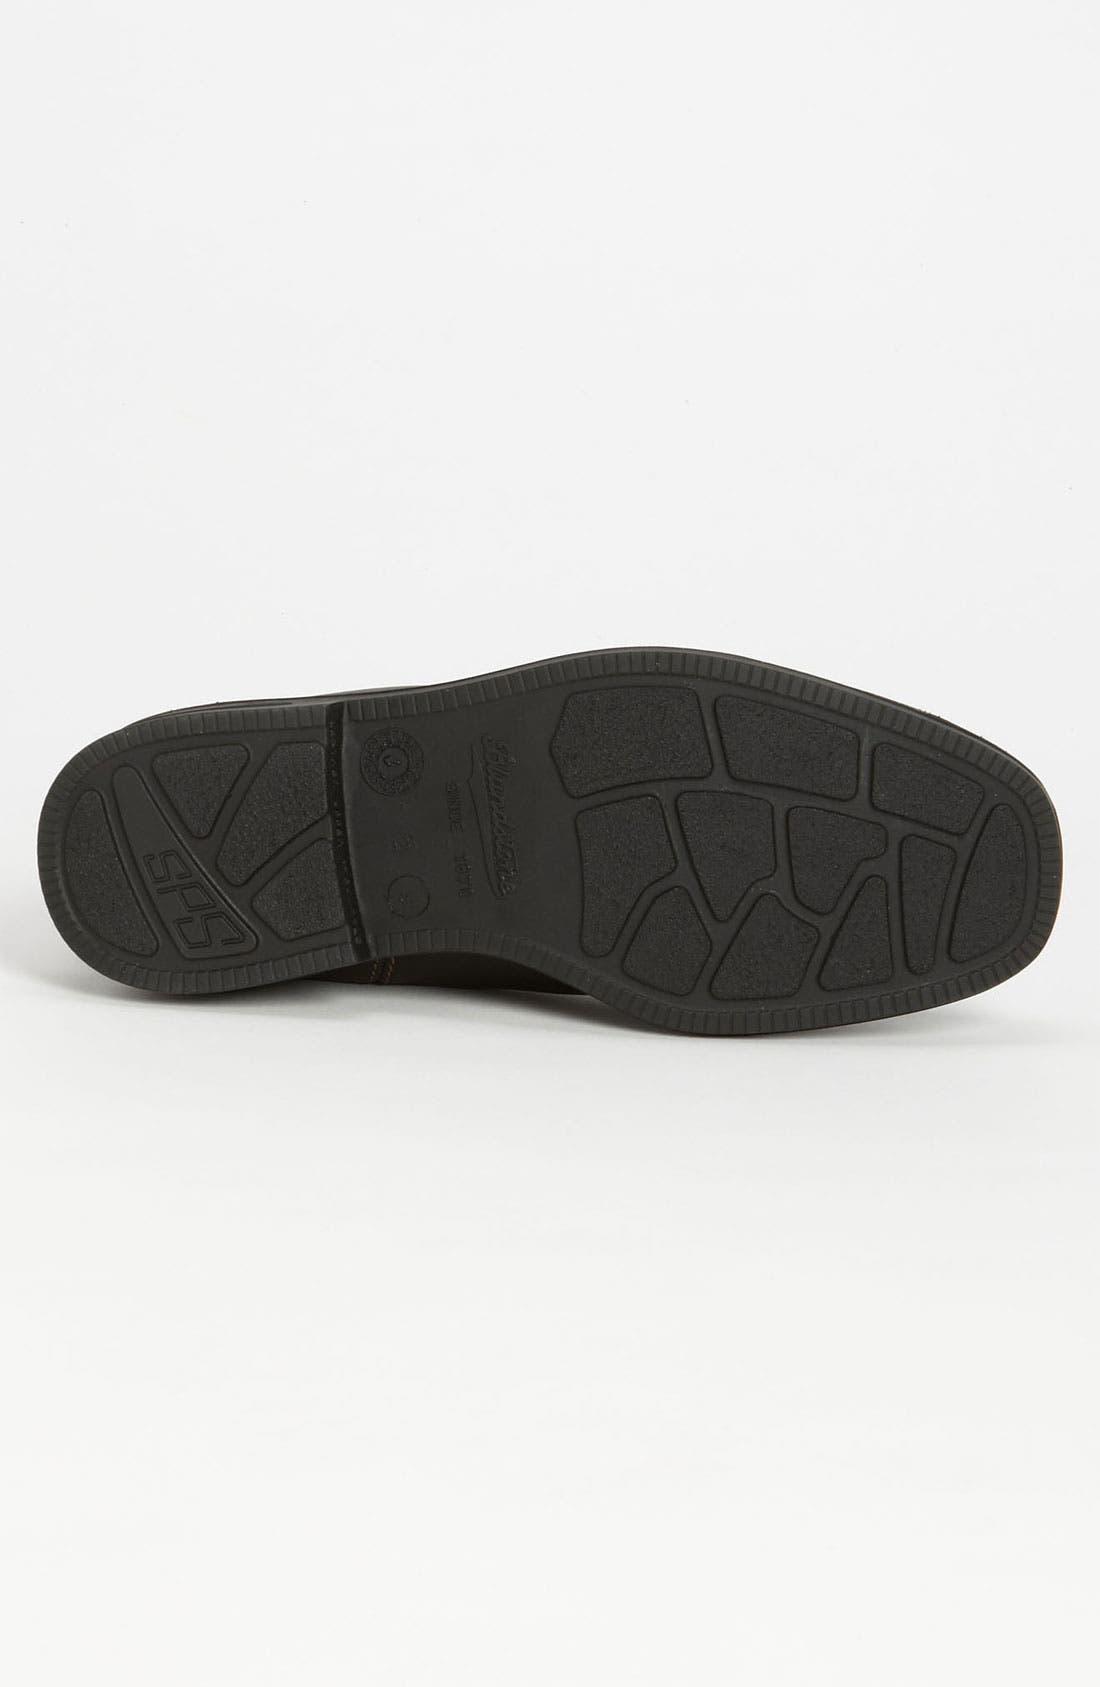 Footwear Chelsea Boot,                             Alternate thumbnail 4, color,                             Stout Brown